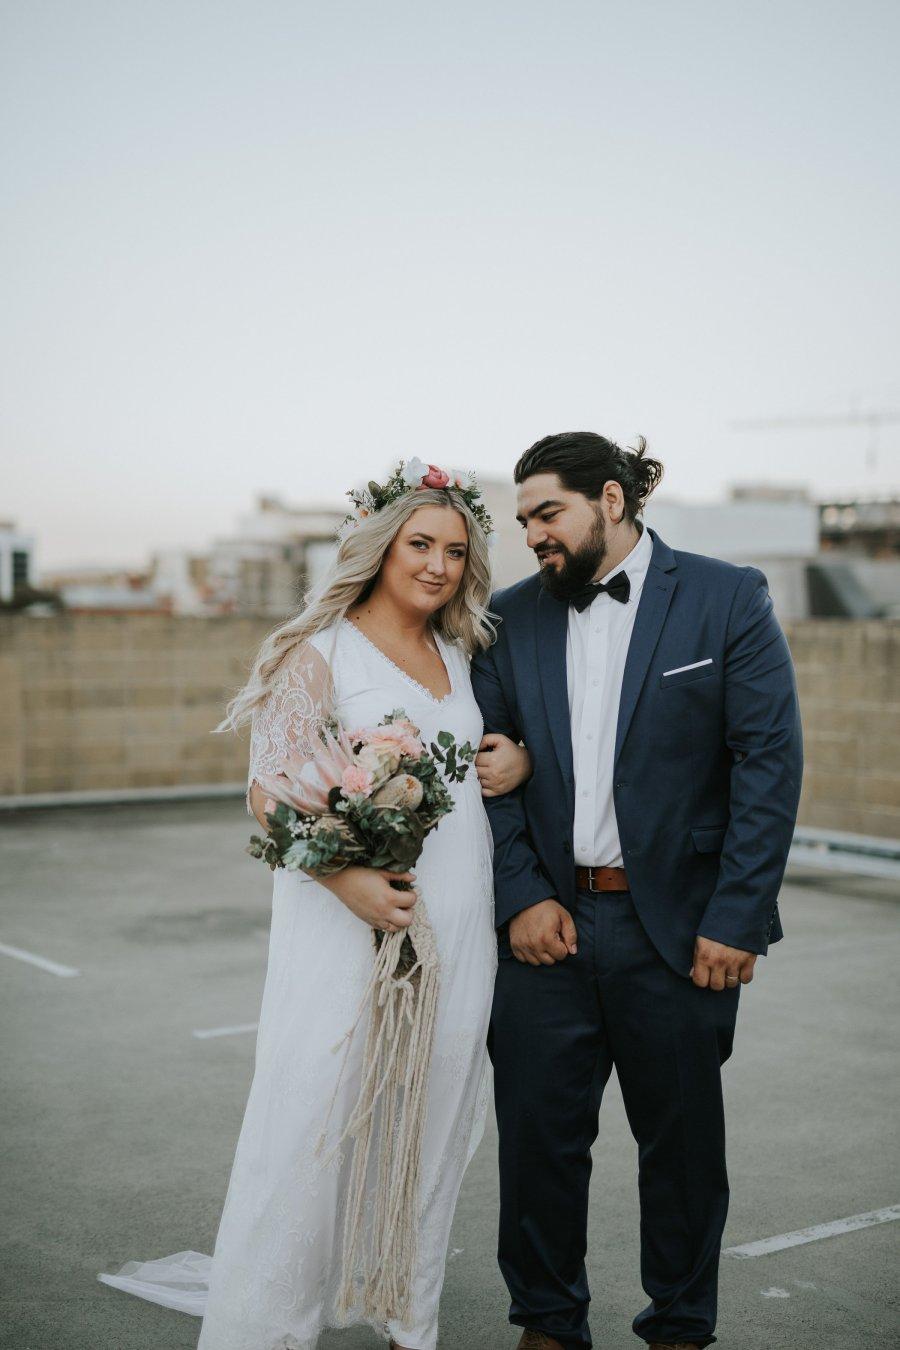 Ebony Blush Photography   Perth wedding Photographer   Perth City Farm Wedding   Imogen + Tristian130